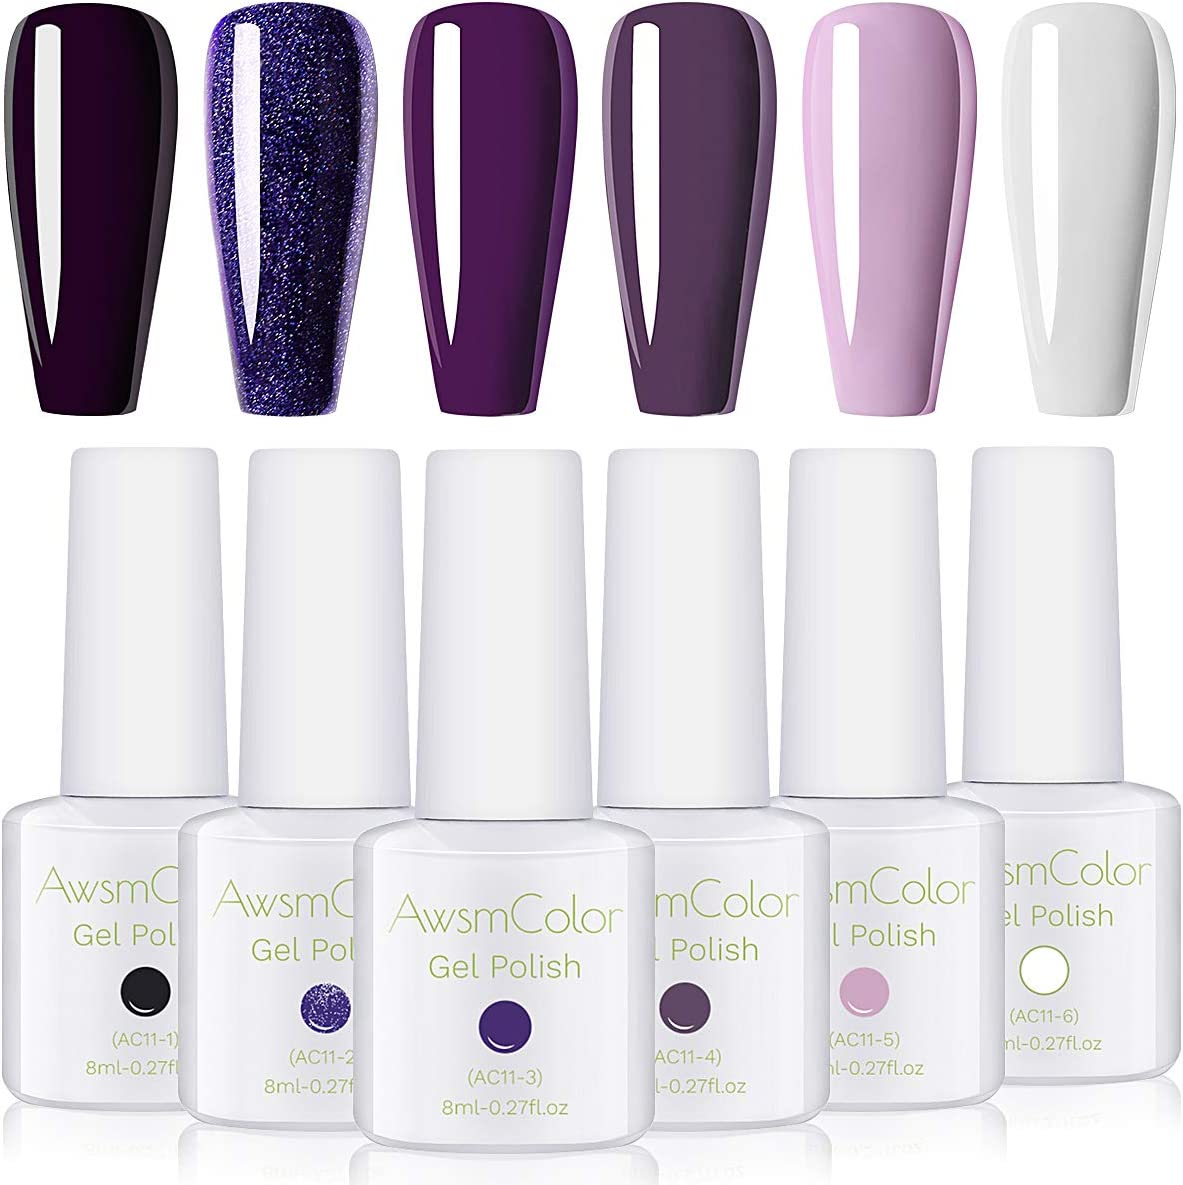 Nail Polish, AwsmColor Purple White Glitter Gel Nail Polish Set Lilac Light Soak Off Nail Gel Polish Kit 6 Bottles 8ML 2020 Design Nail Art for Women Girl Manicure DIY Home